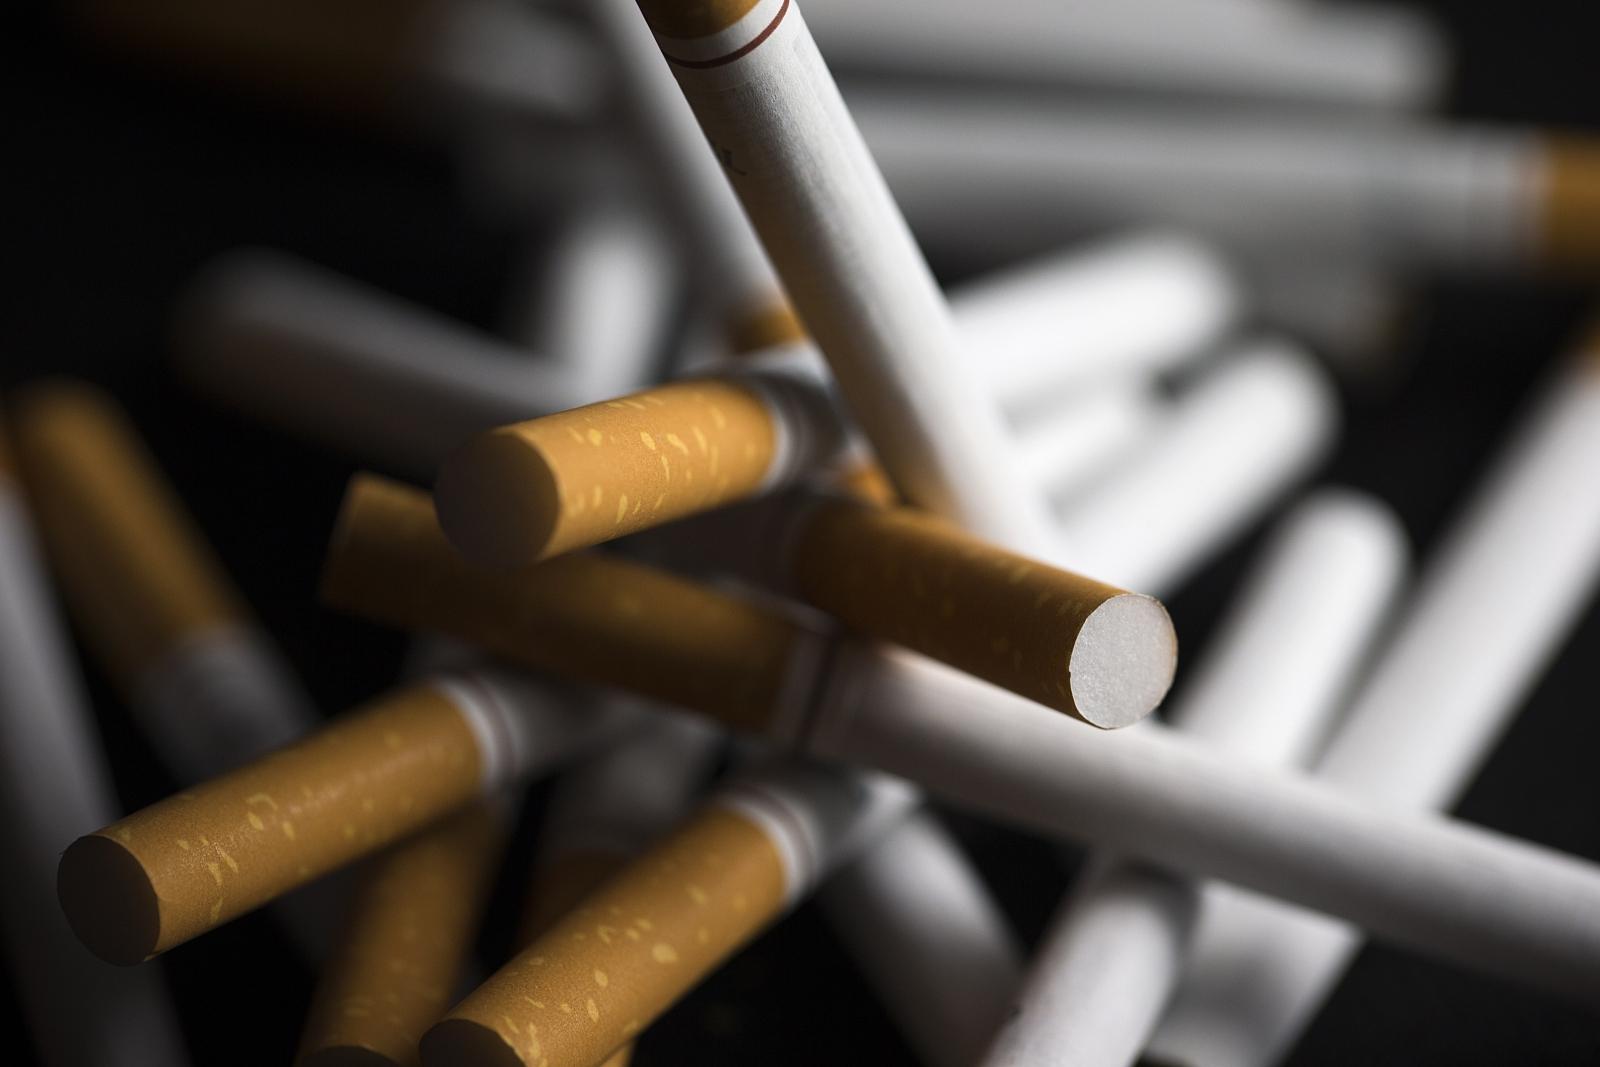 E cigarette cartridges nicotine free